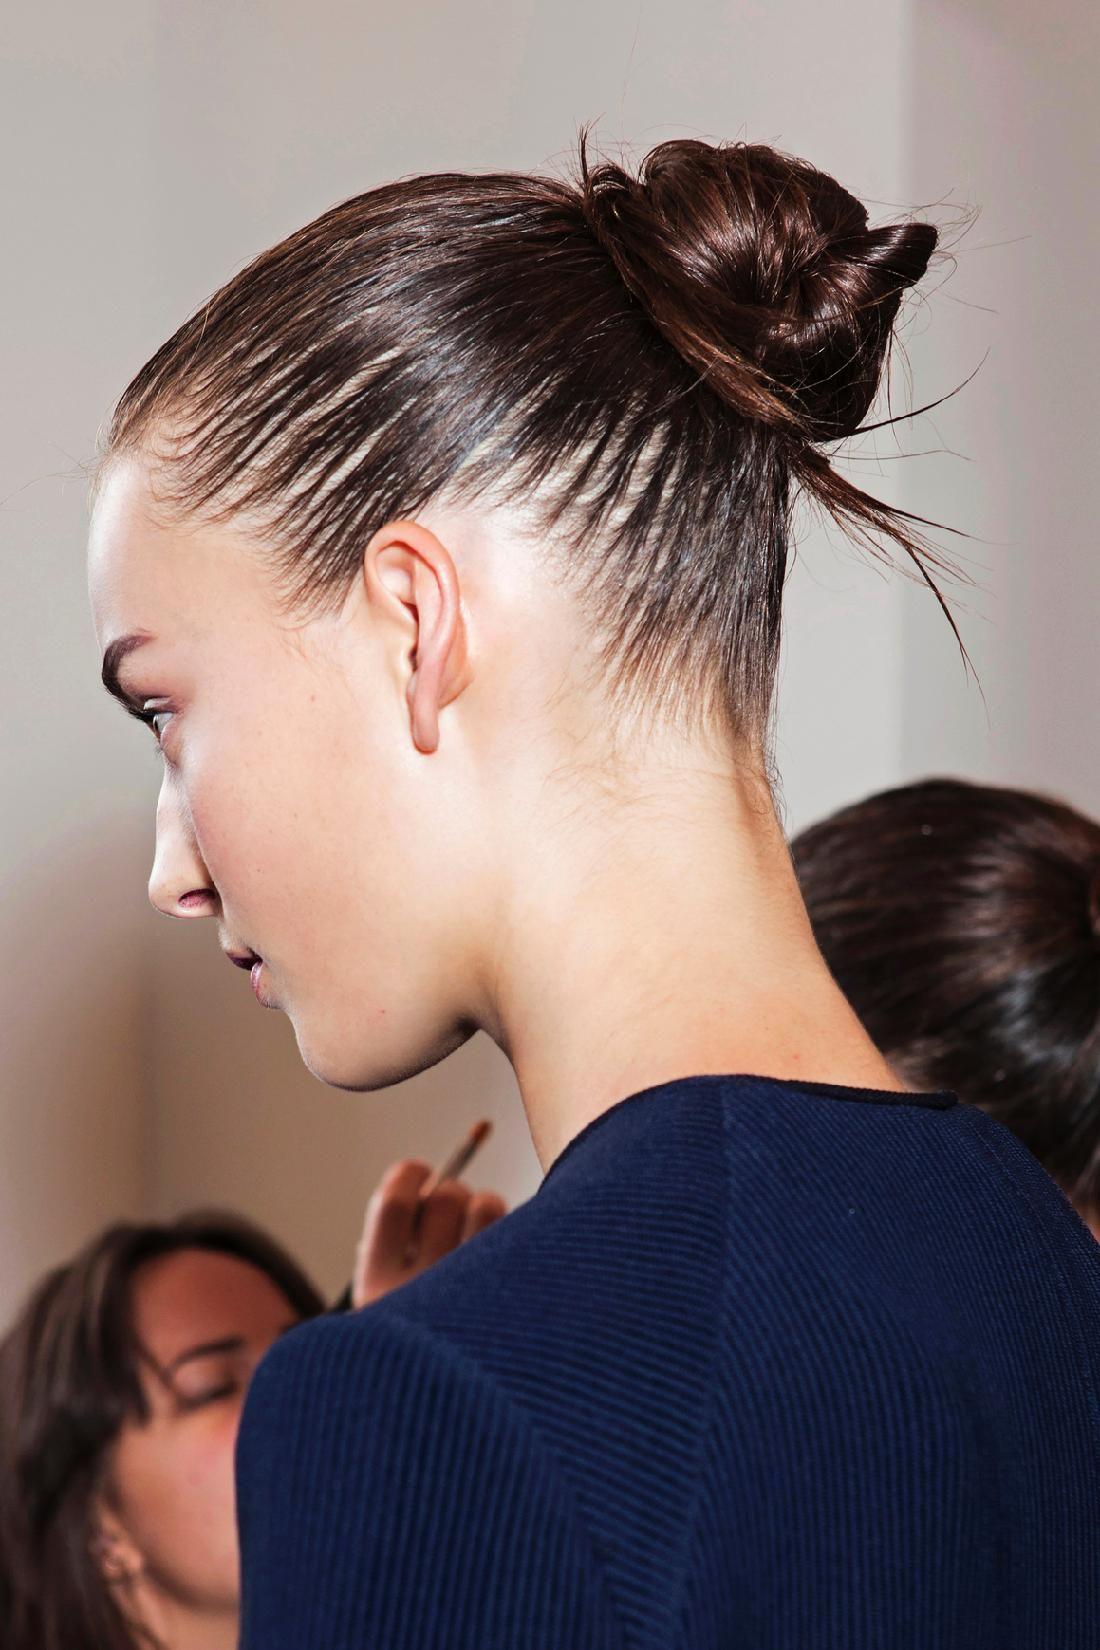 Épinglé sur Hair + Beauty